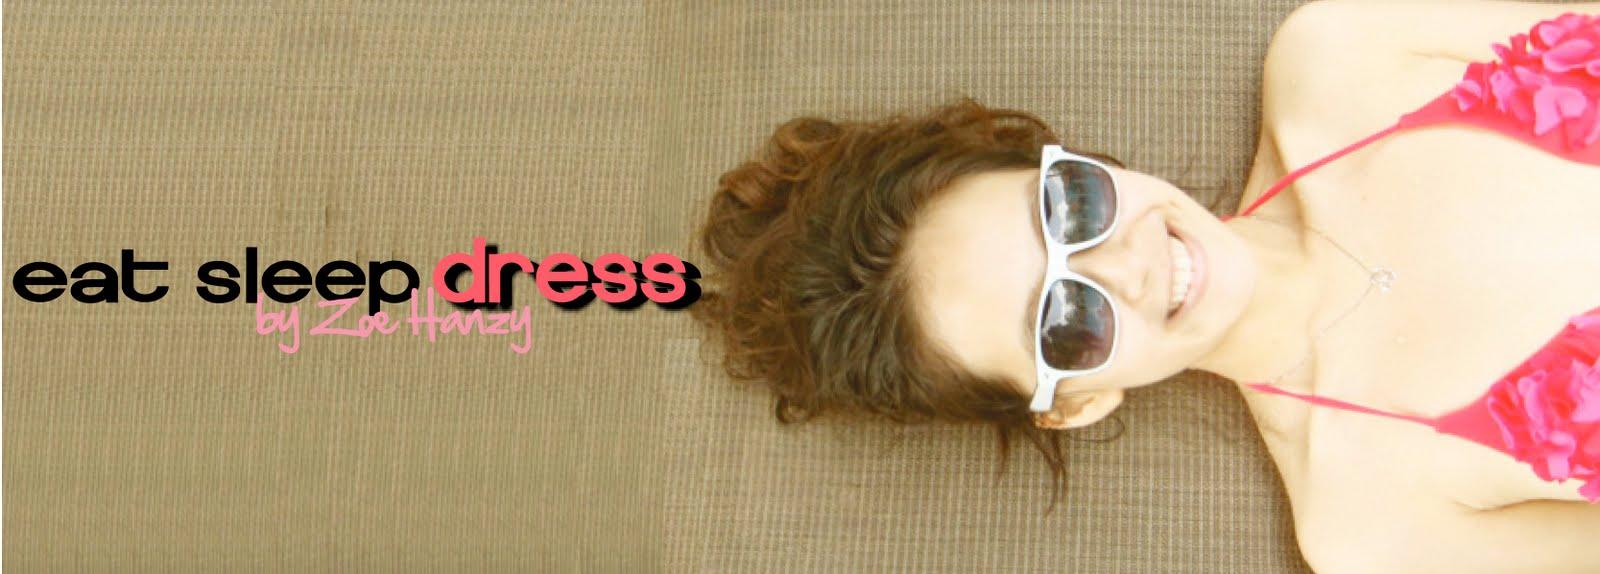 EAT SLEEP DRESS by Zoe Hanzy